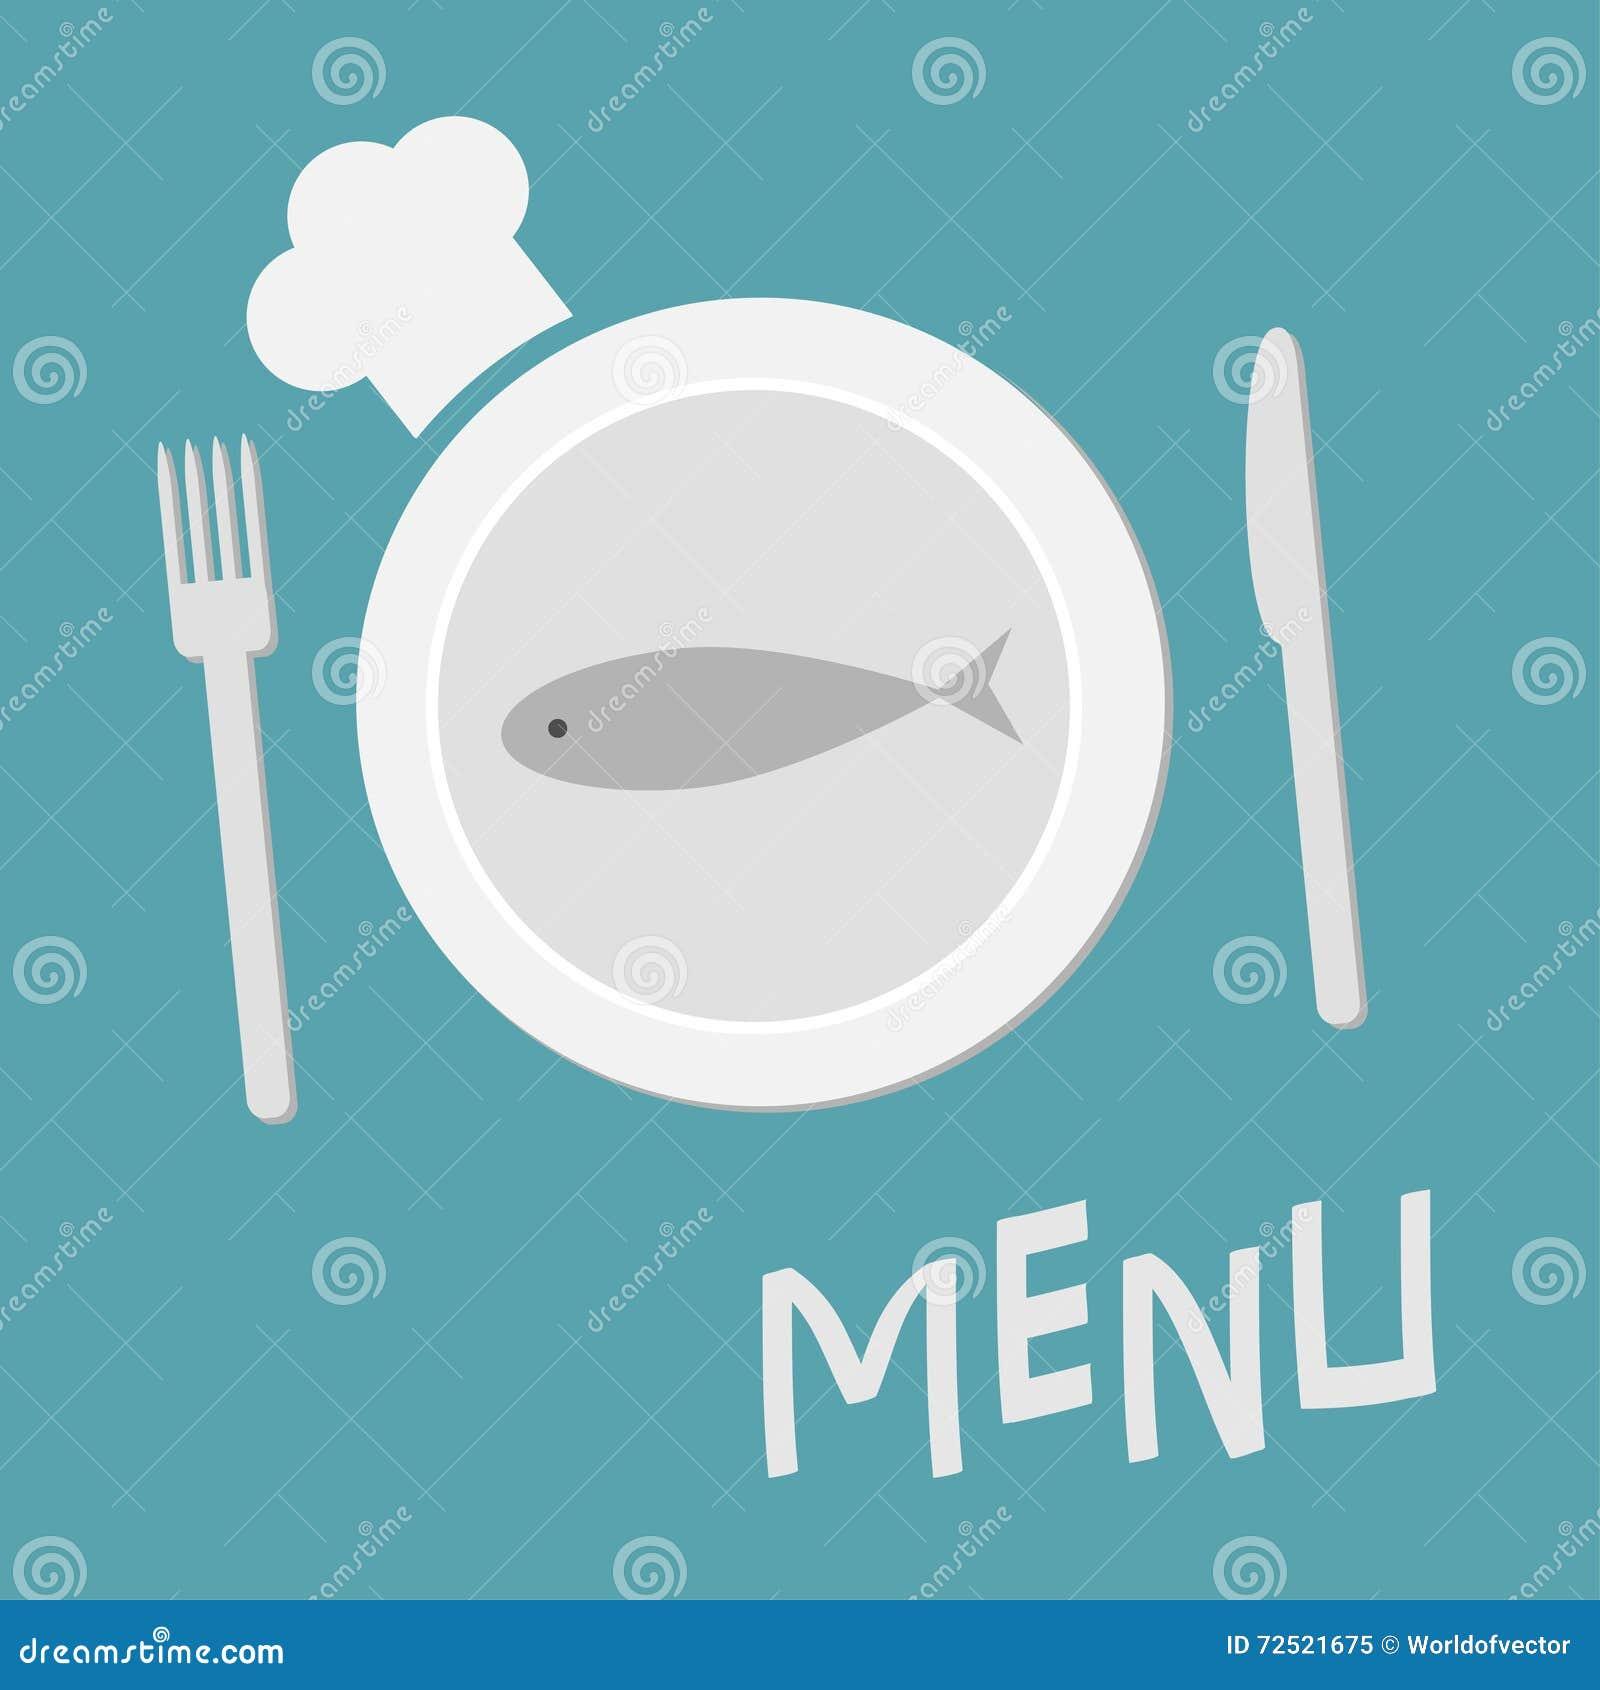 Blue Plate Kitchen Brunch Menu